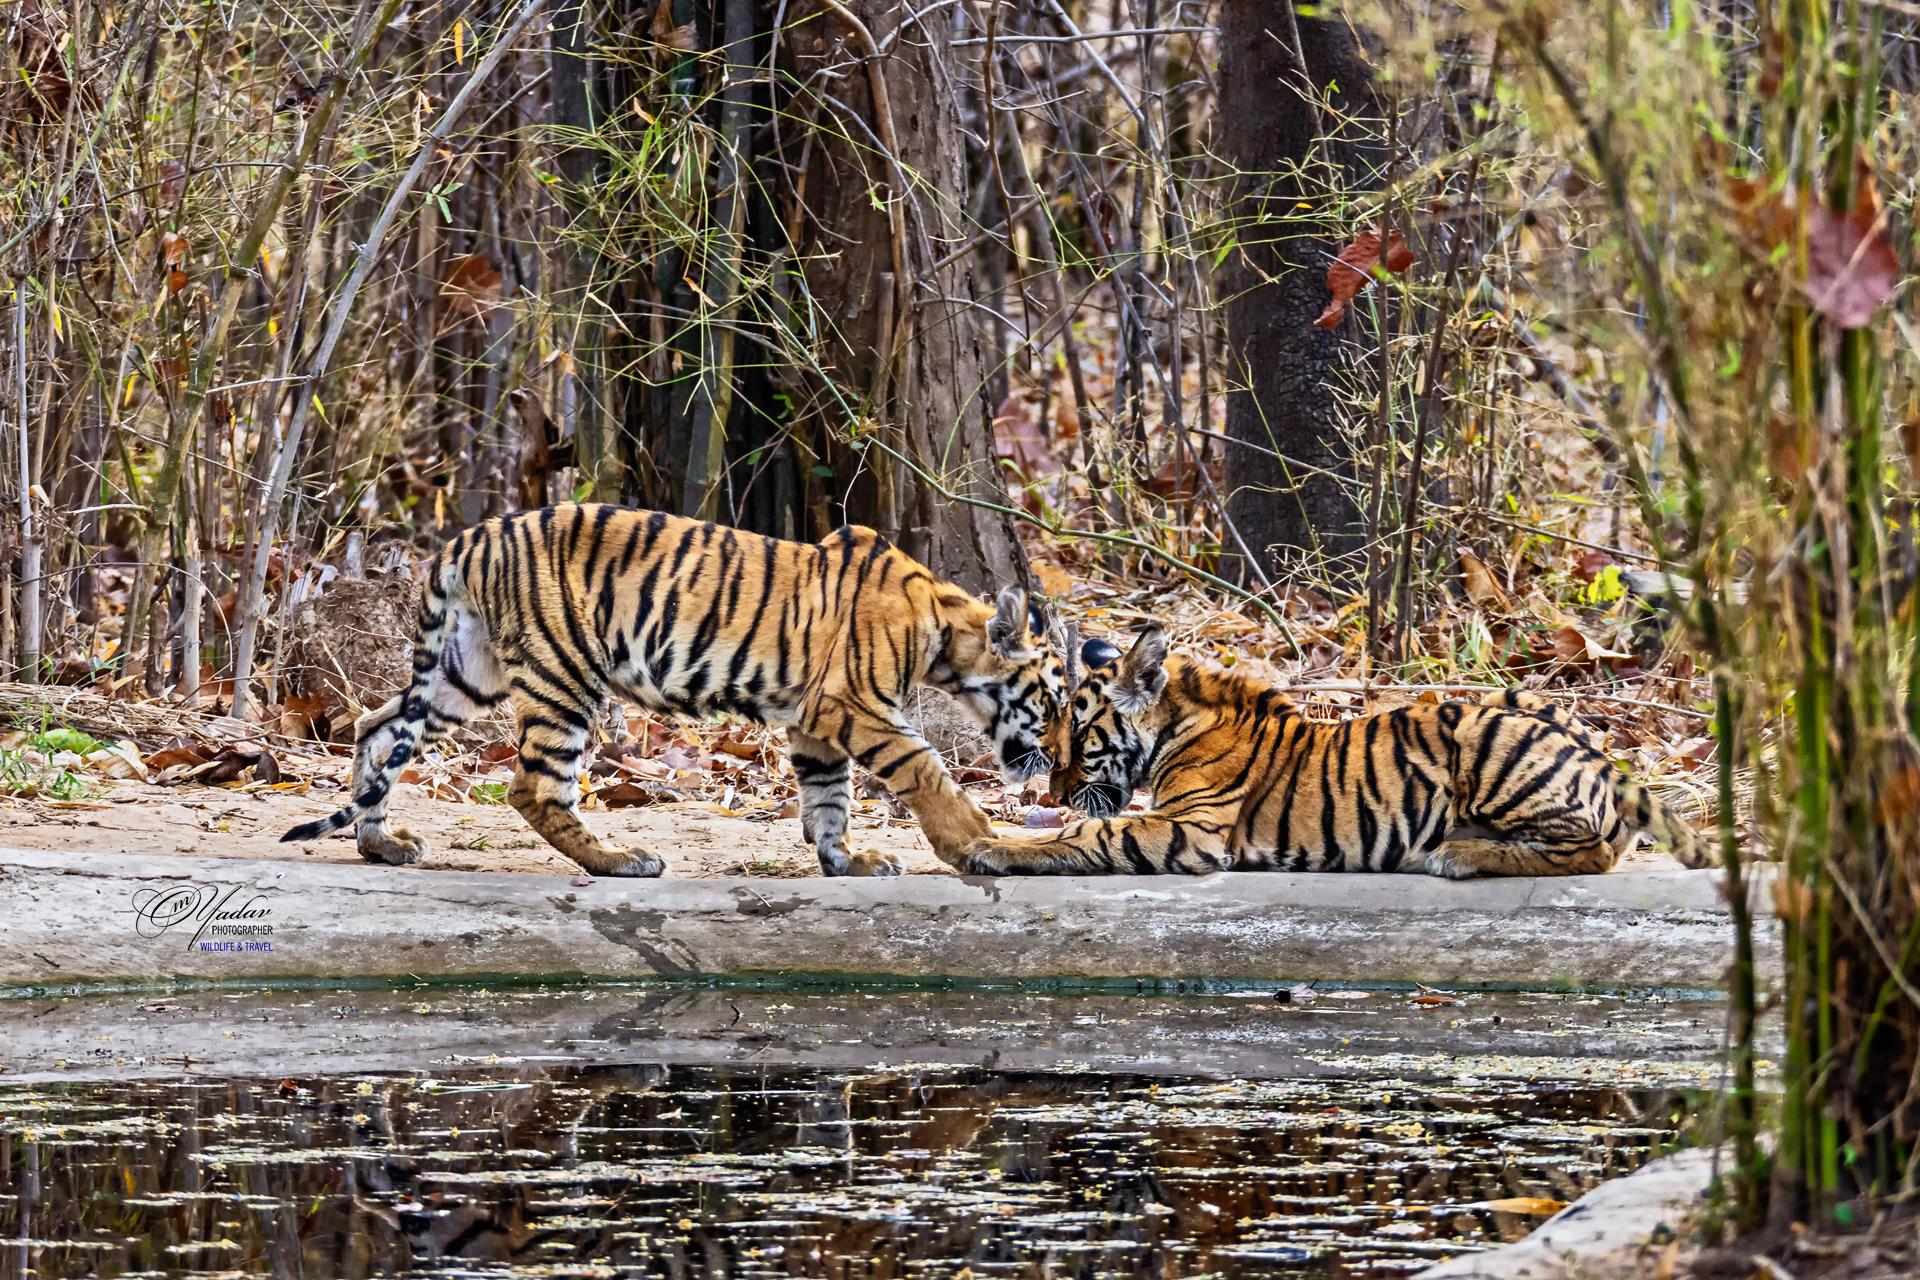 2. Wildlife Crime Control